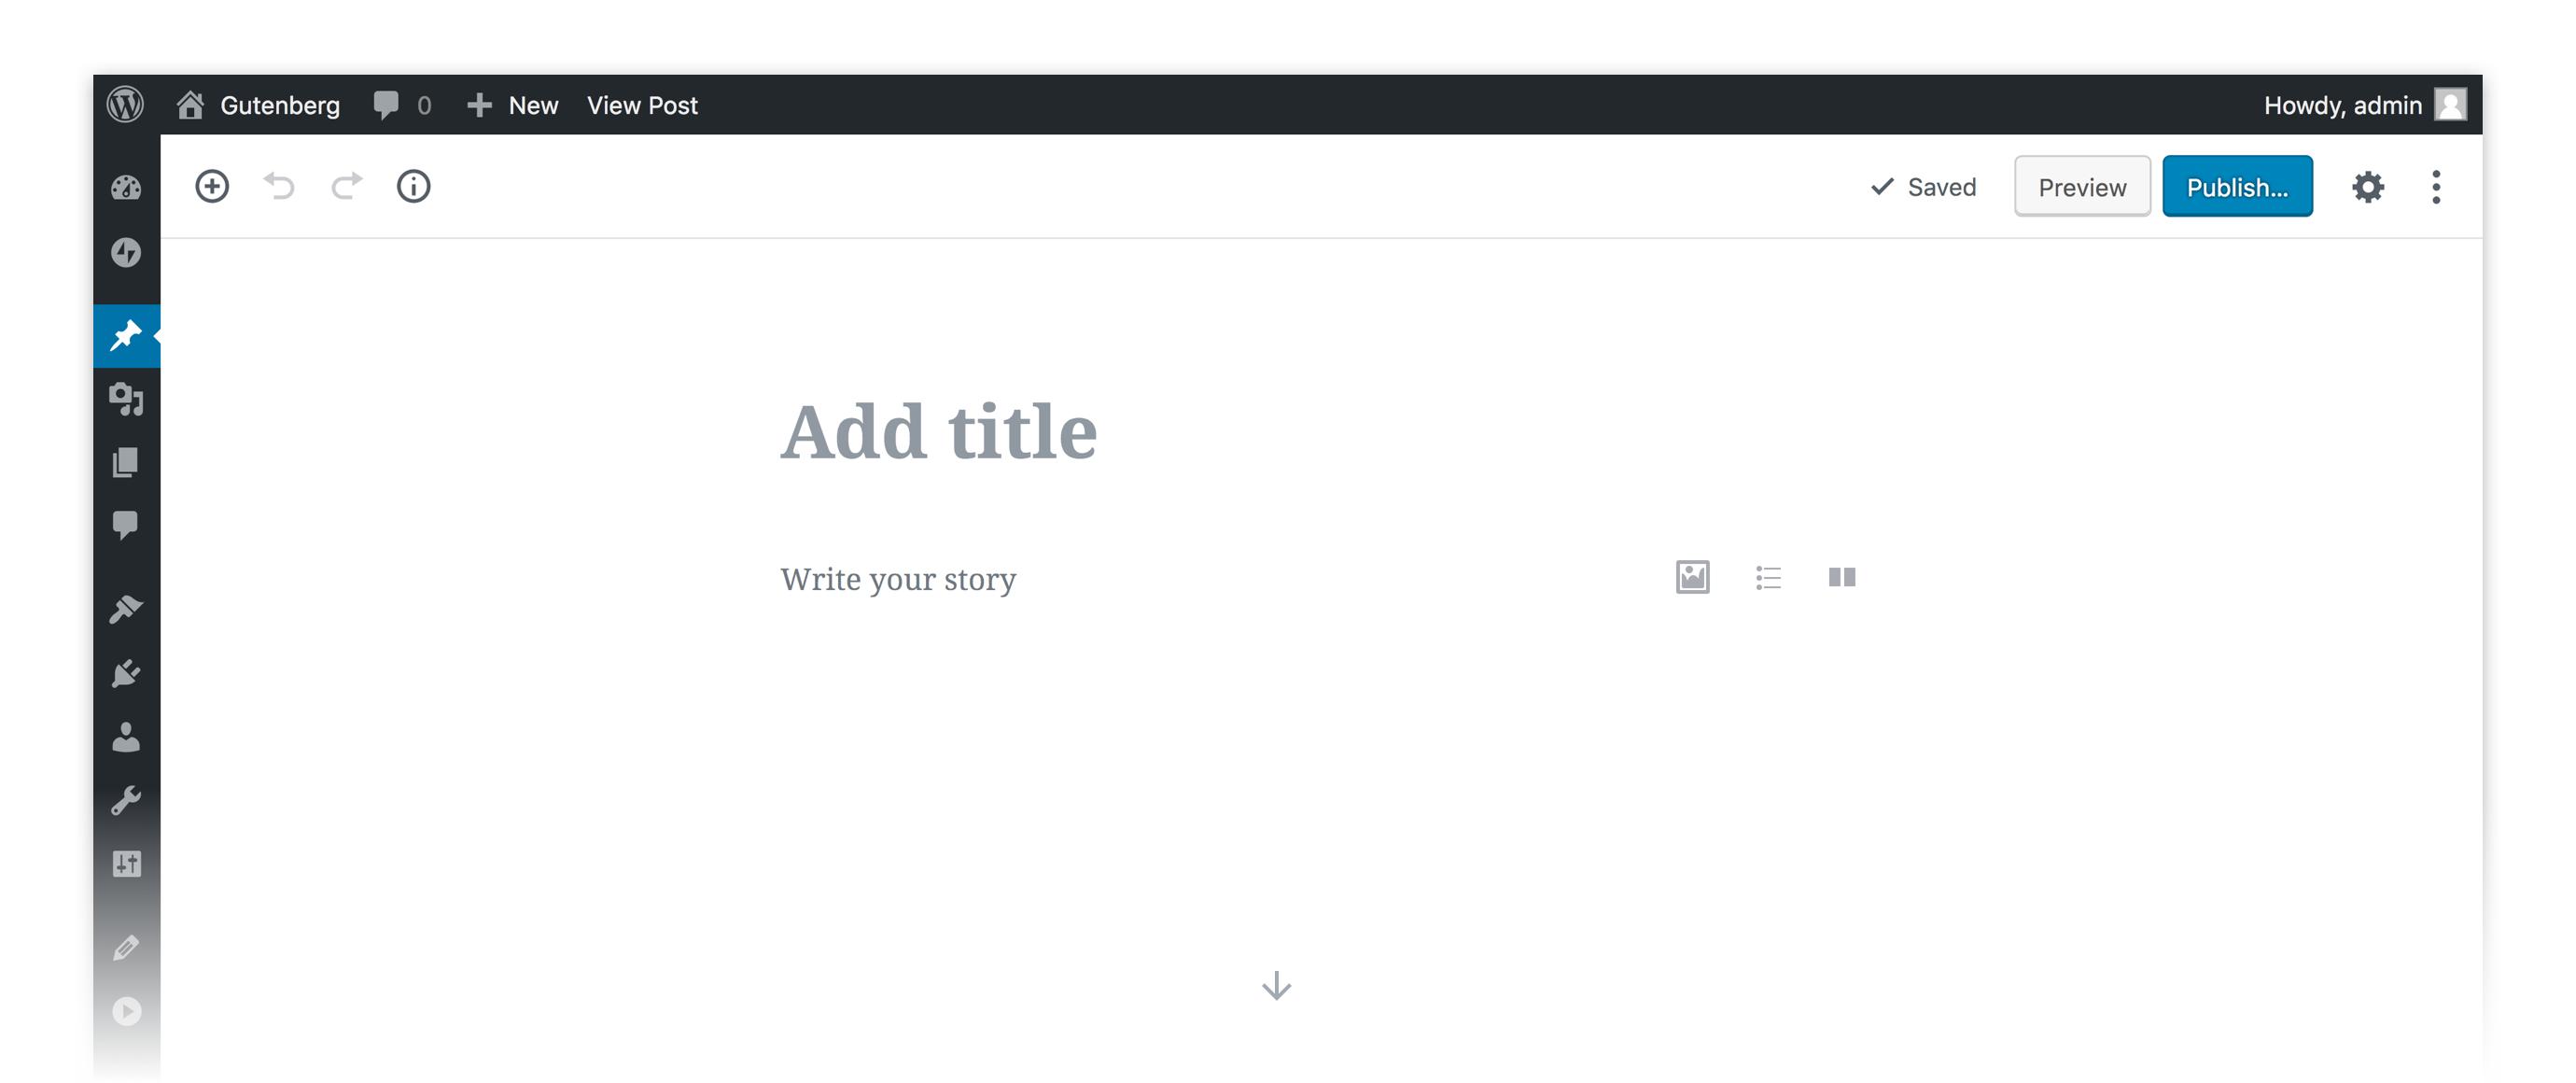 Wordpress 5.0 Gutenberg Block Editor Example